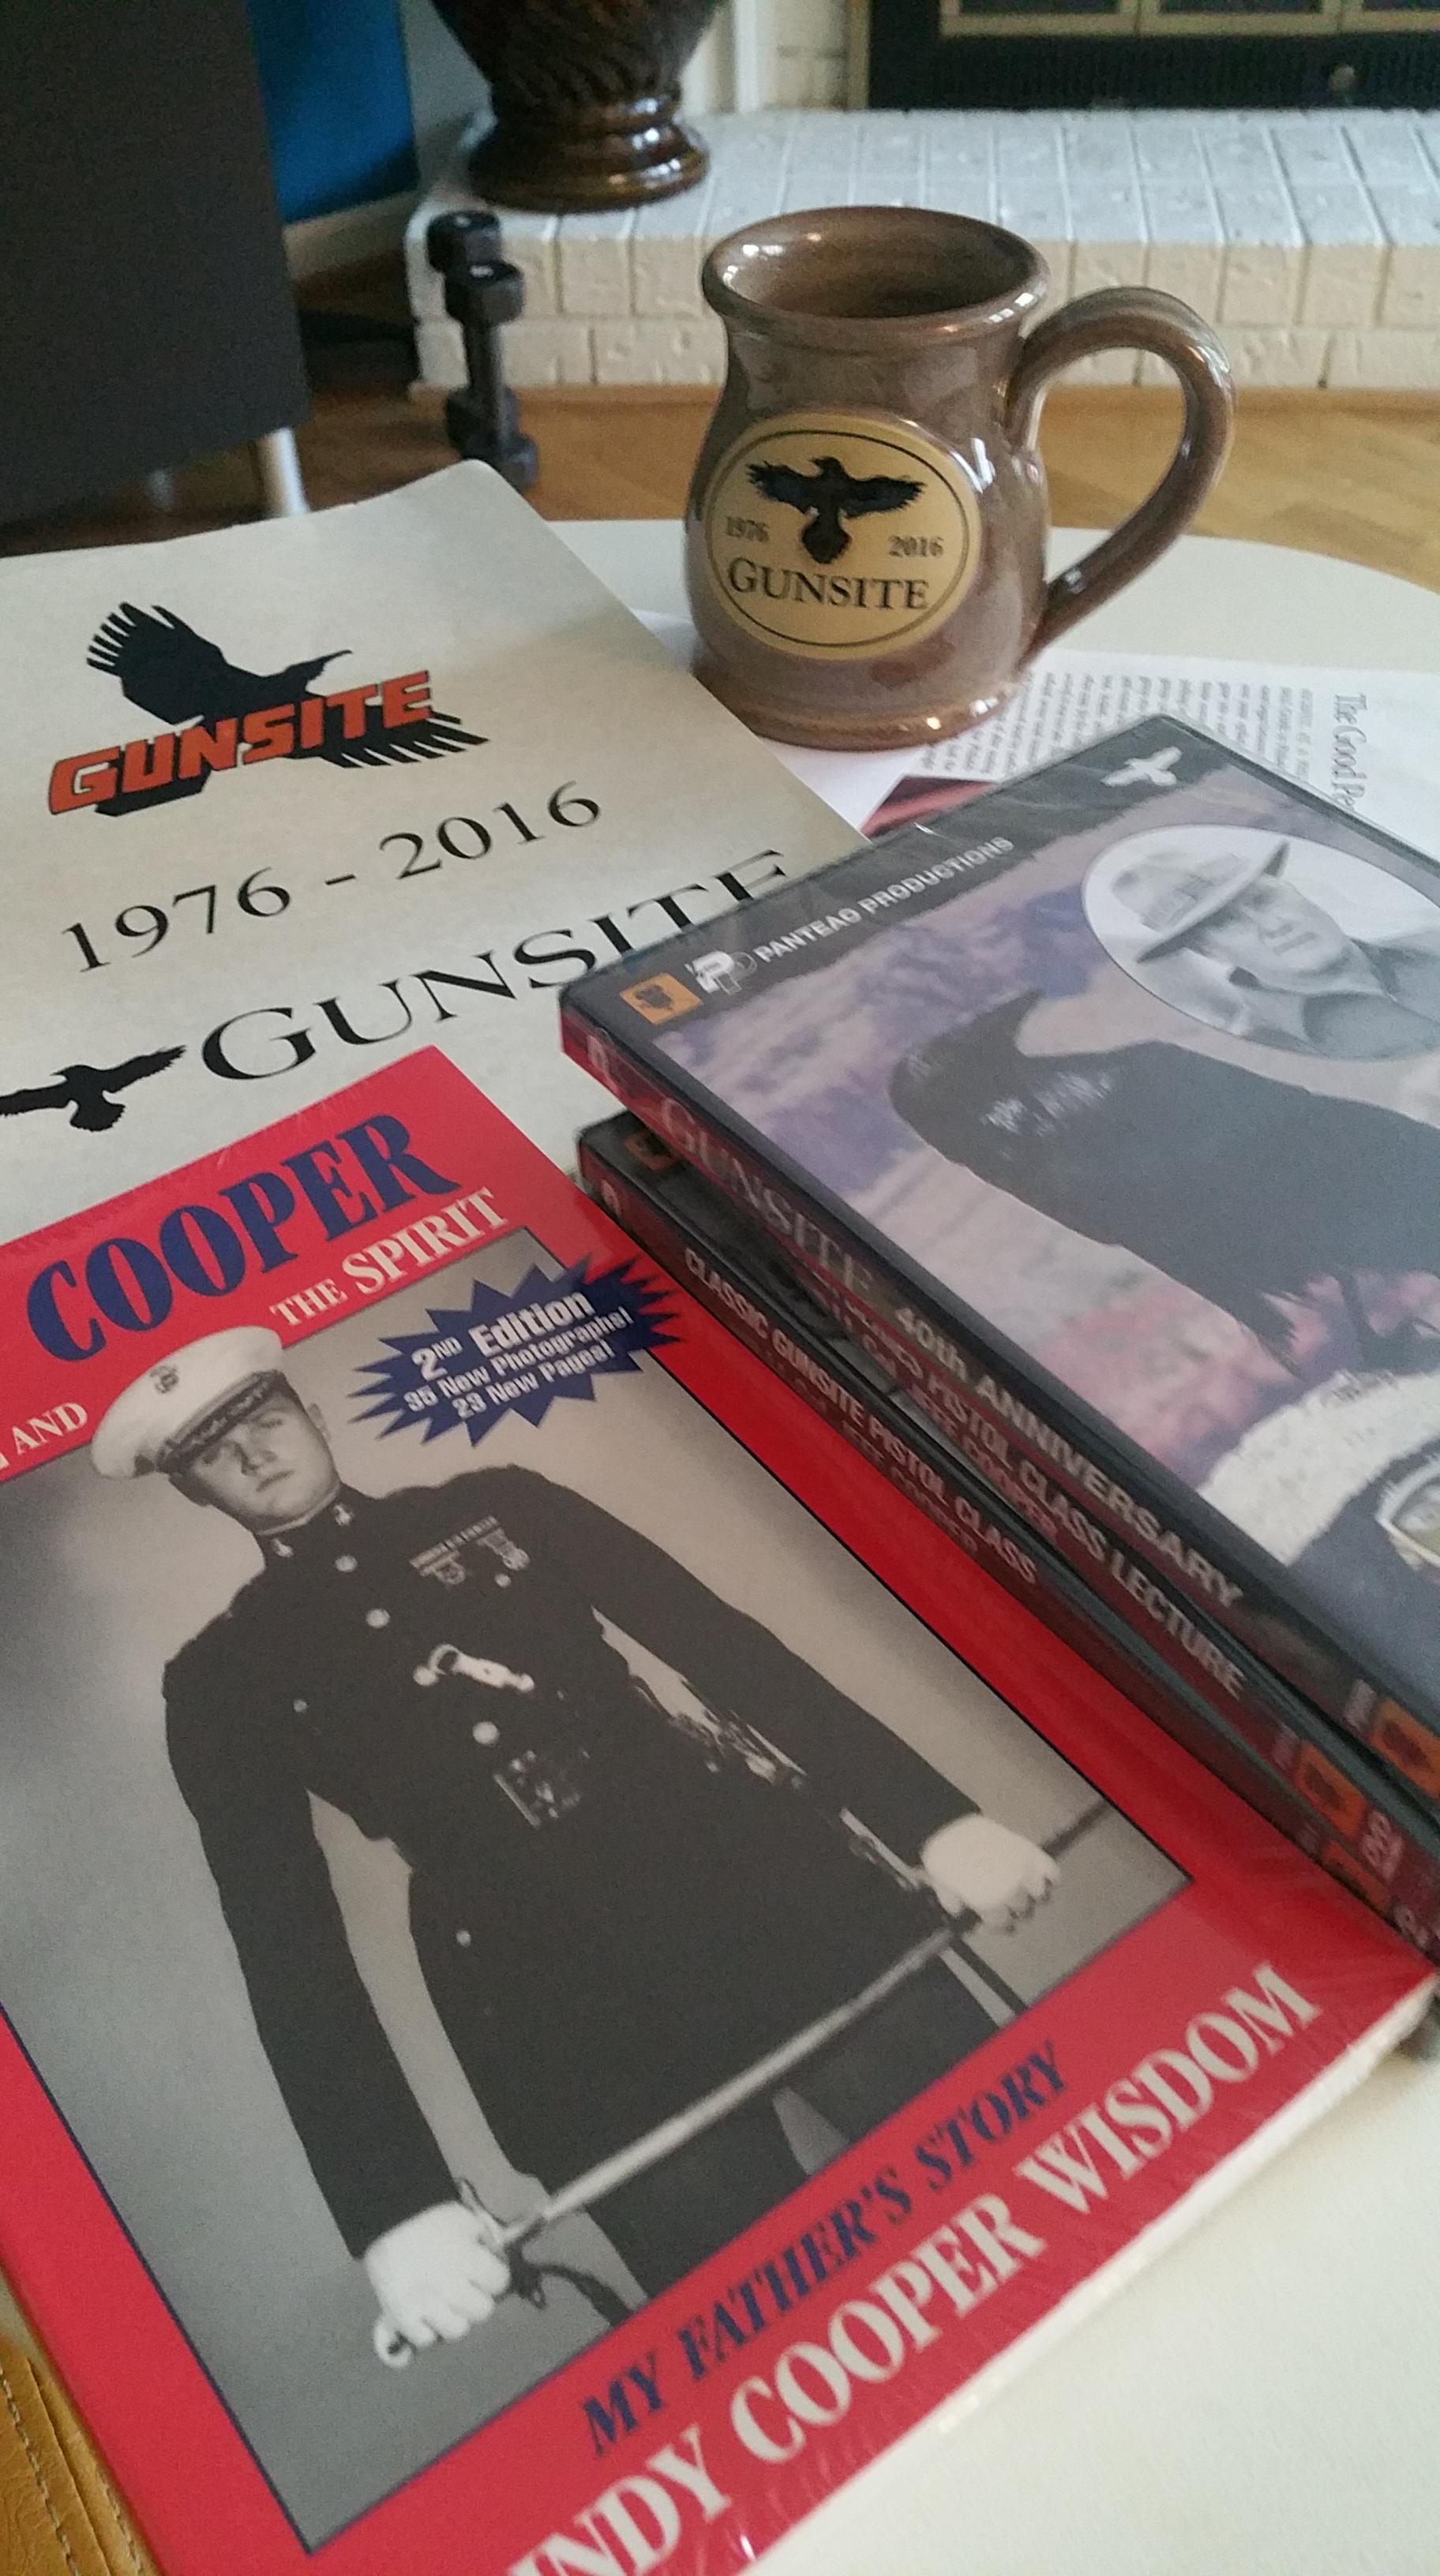 Col. Jeff Cooper, Life Insurance Salesman